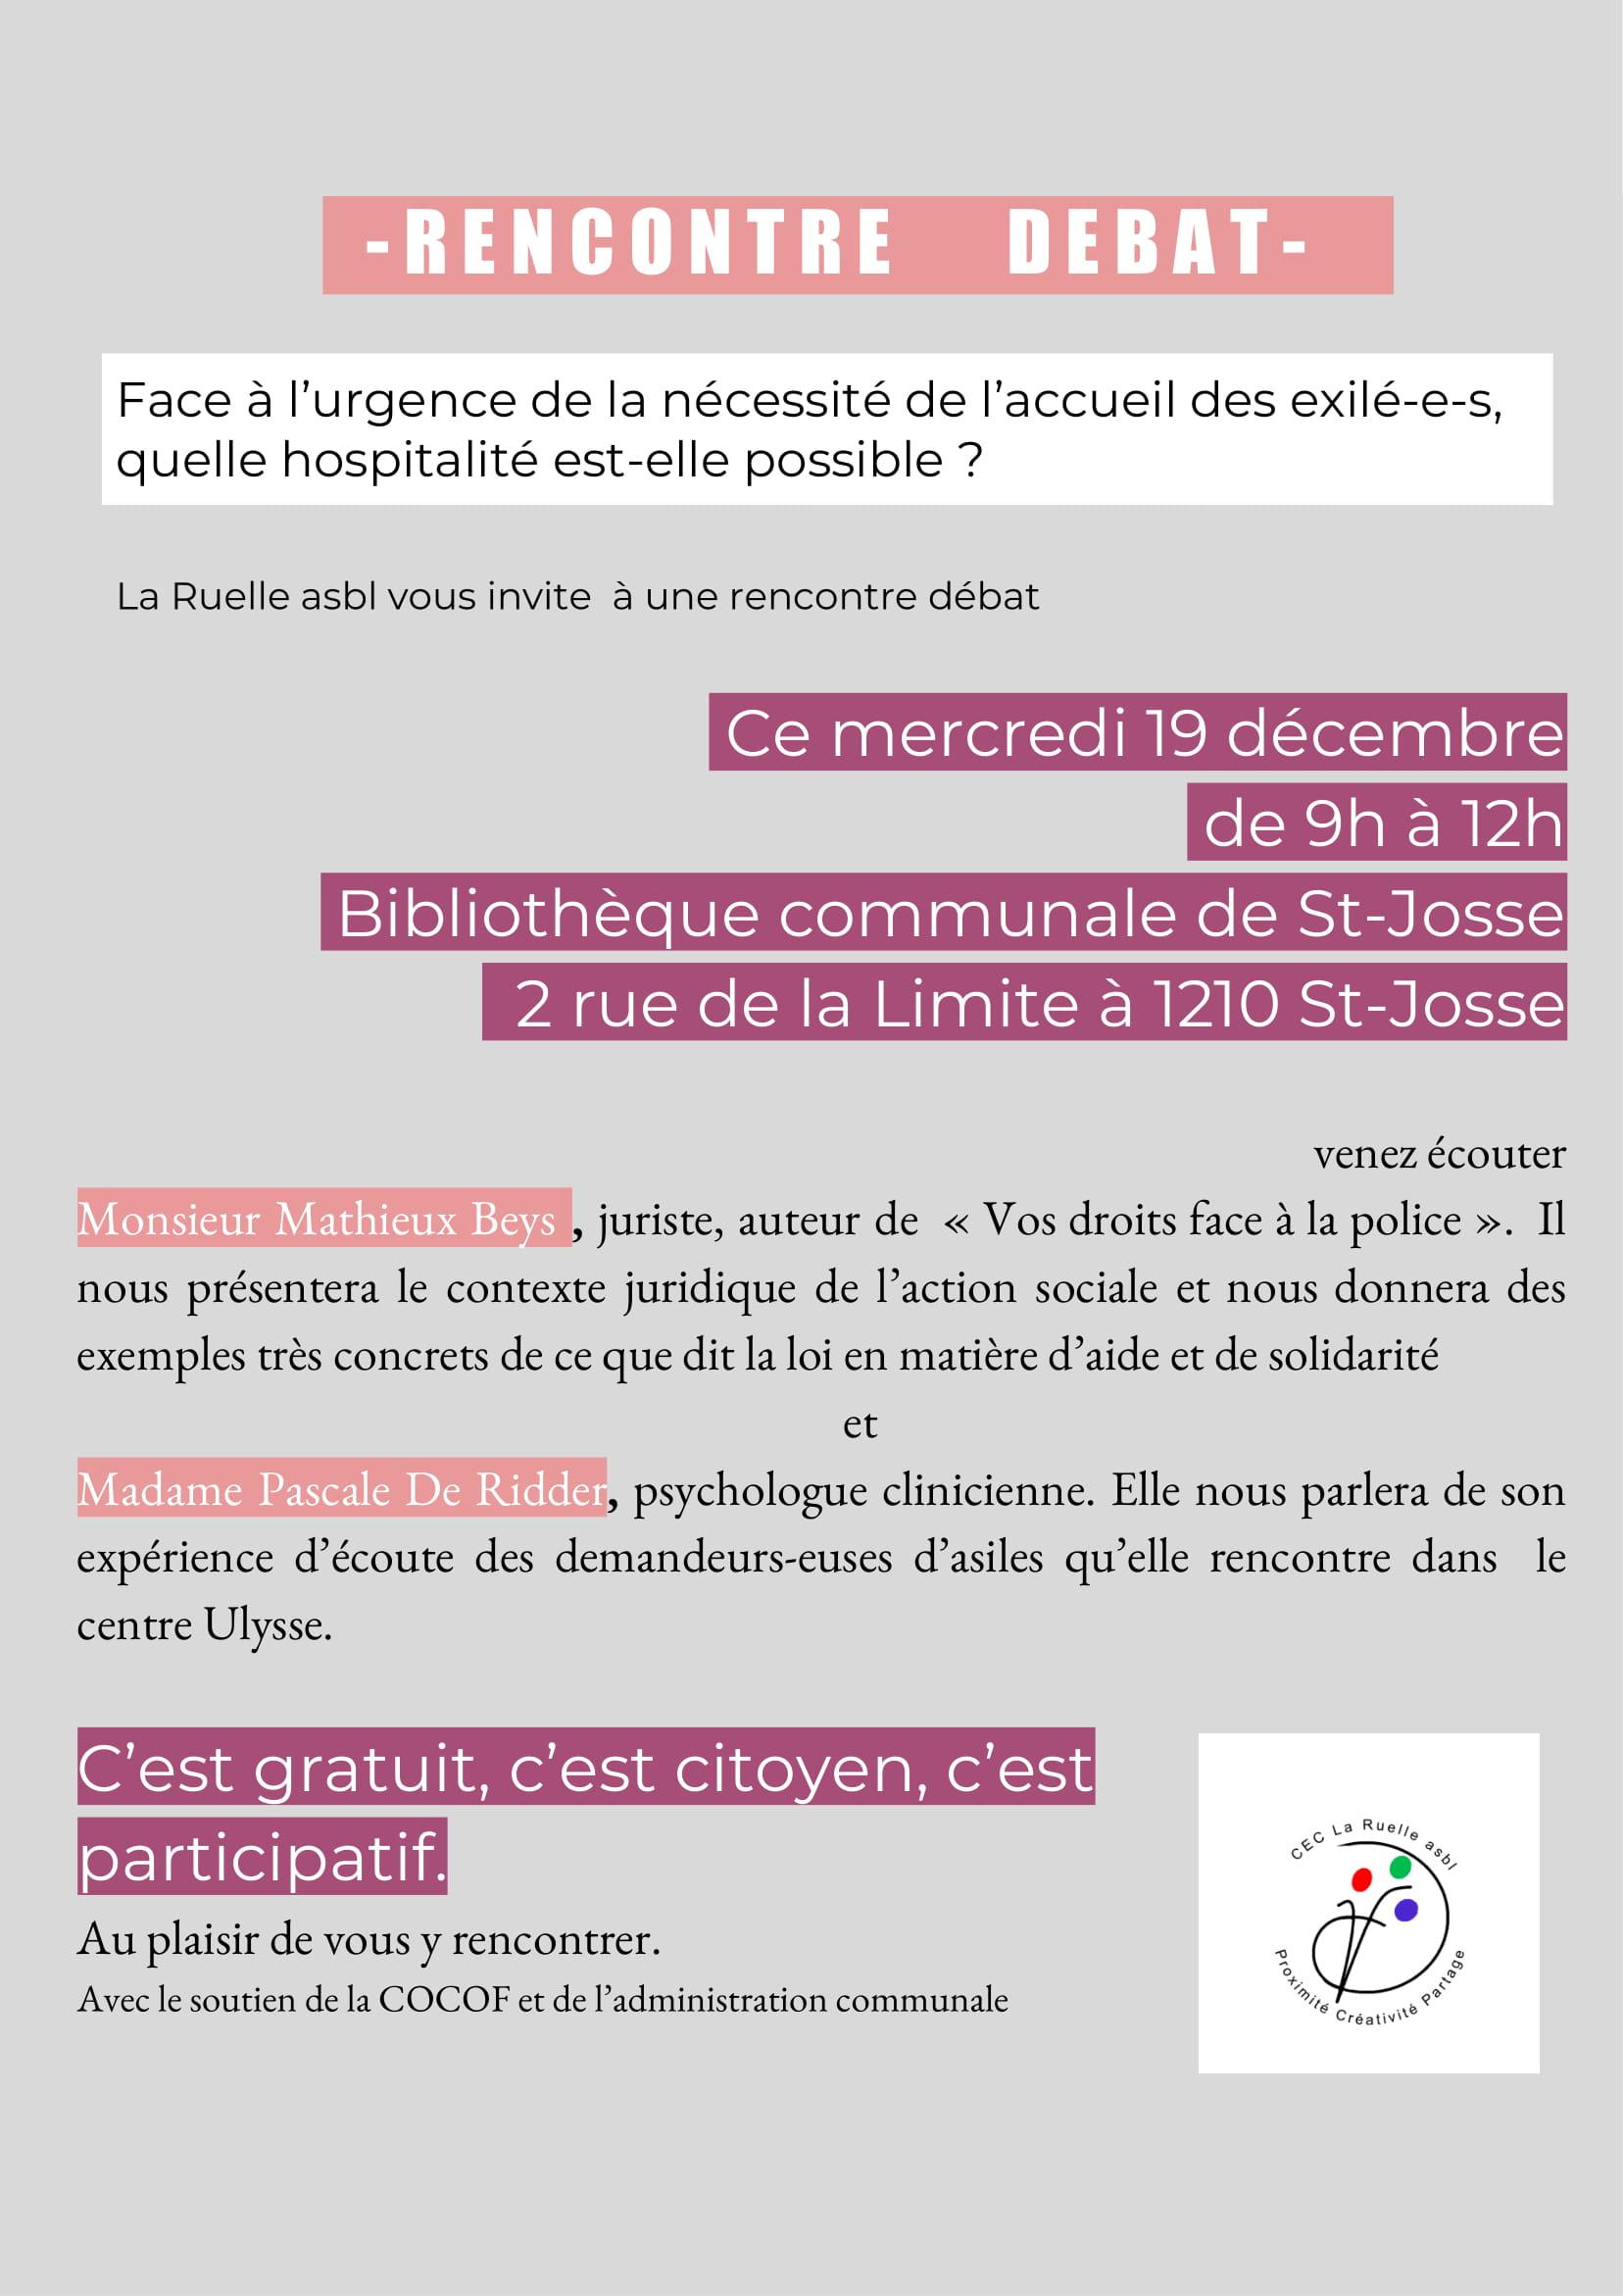 rencontre totalement gratuite belgique saint josse ten noode